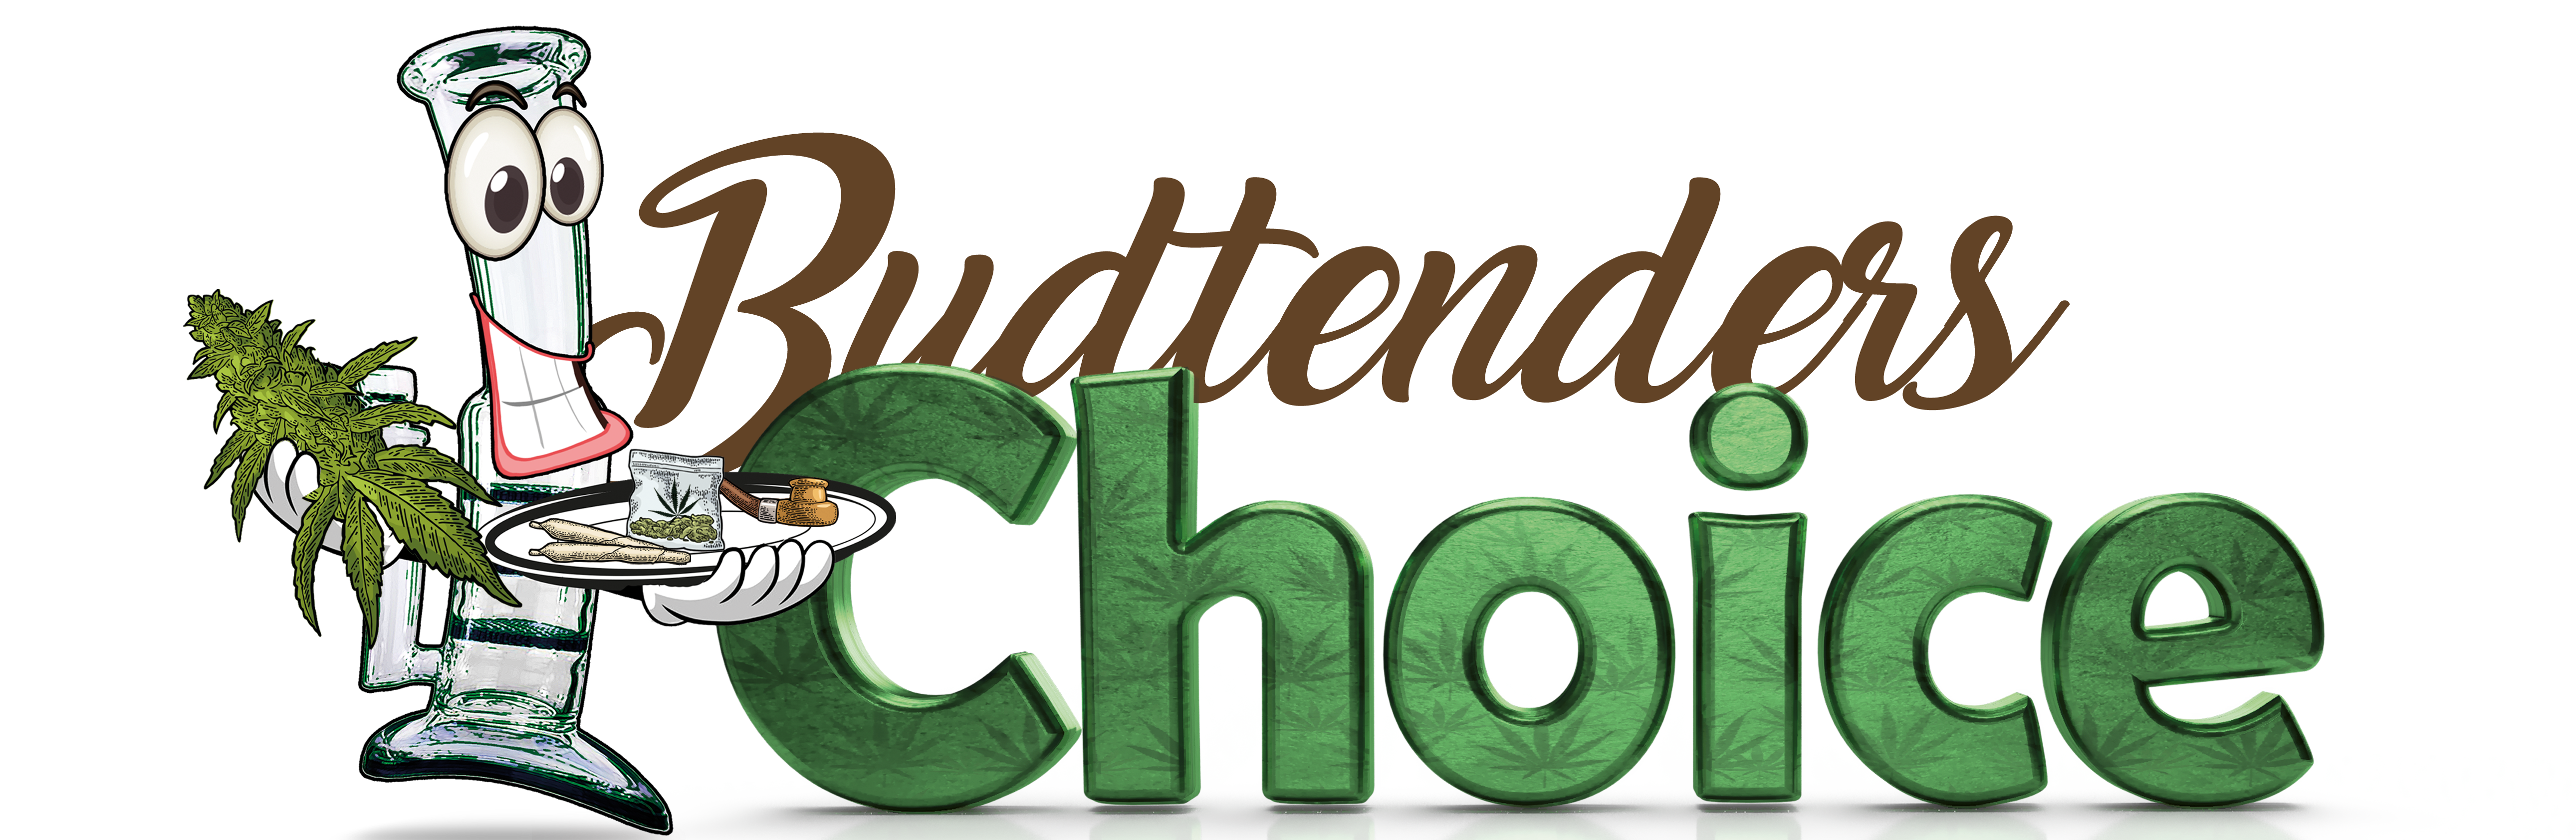 Cannabis | Coffeeshop | Headshop | Garden Supplies